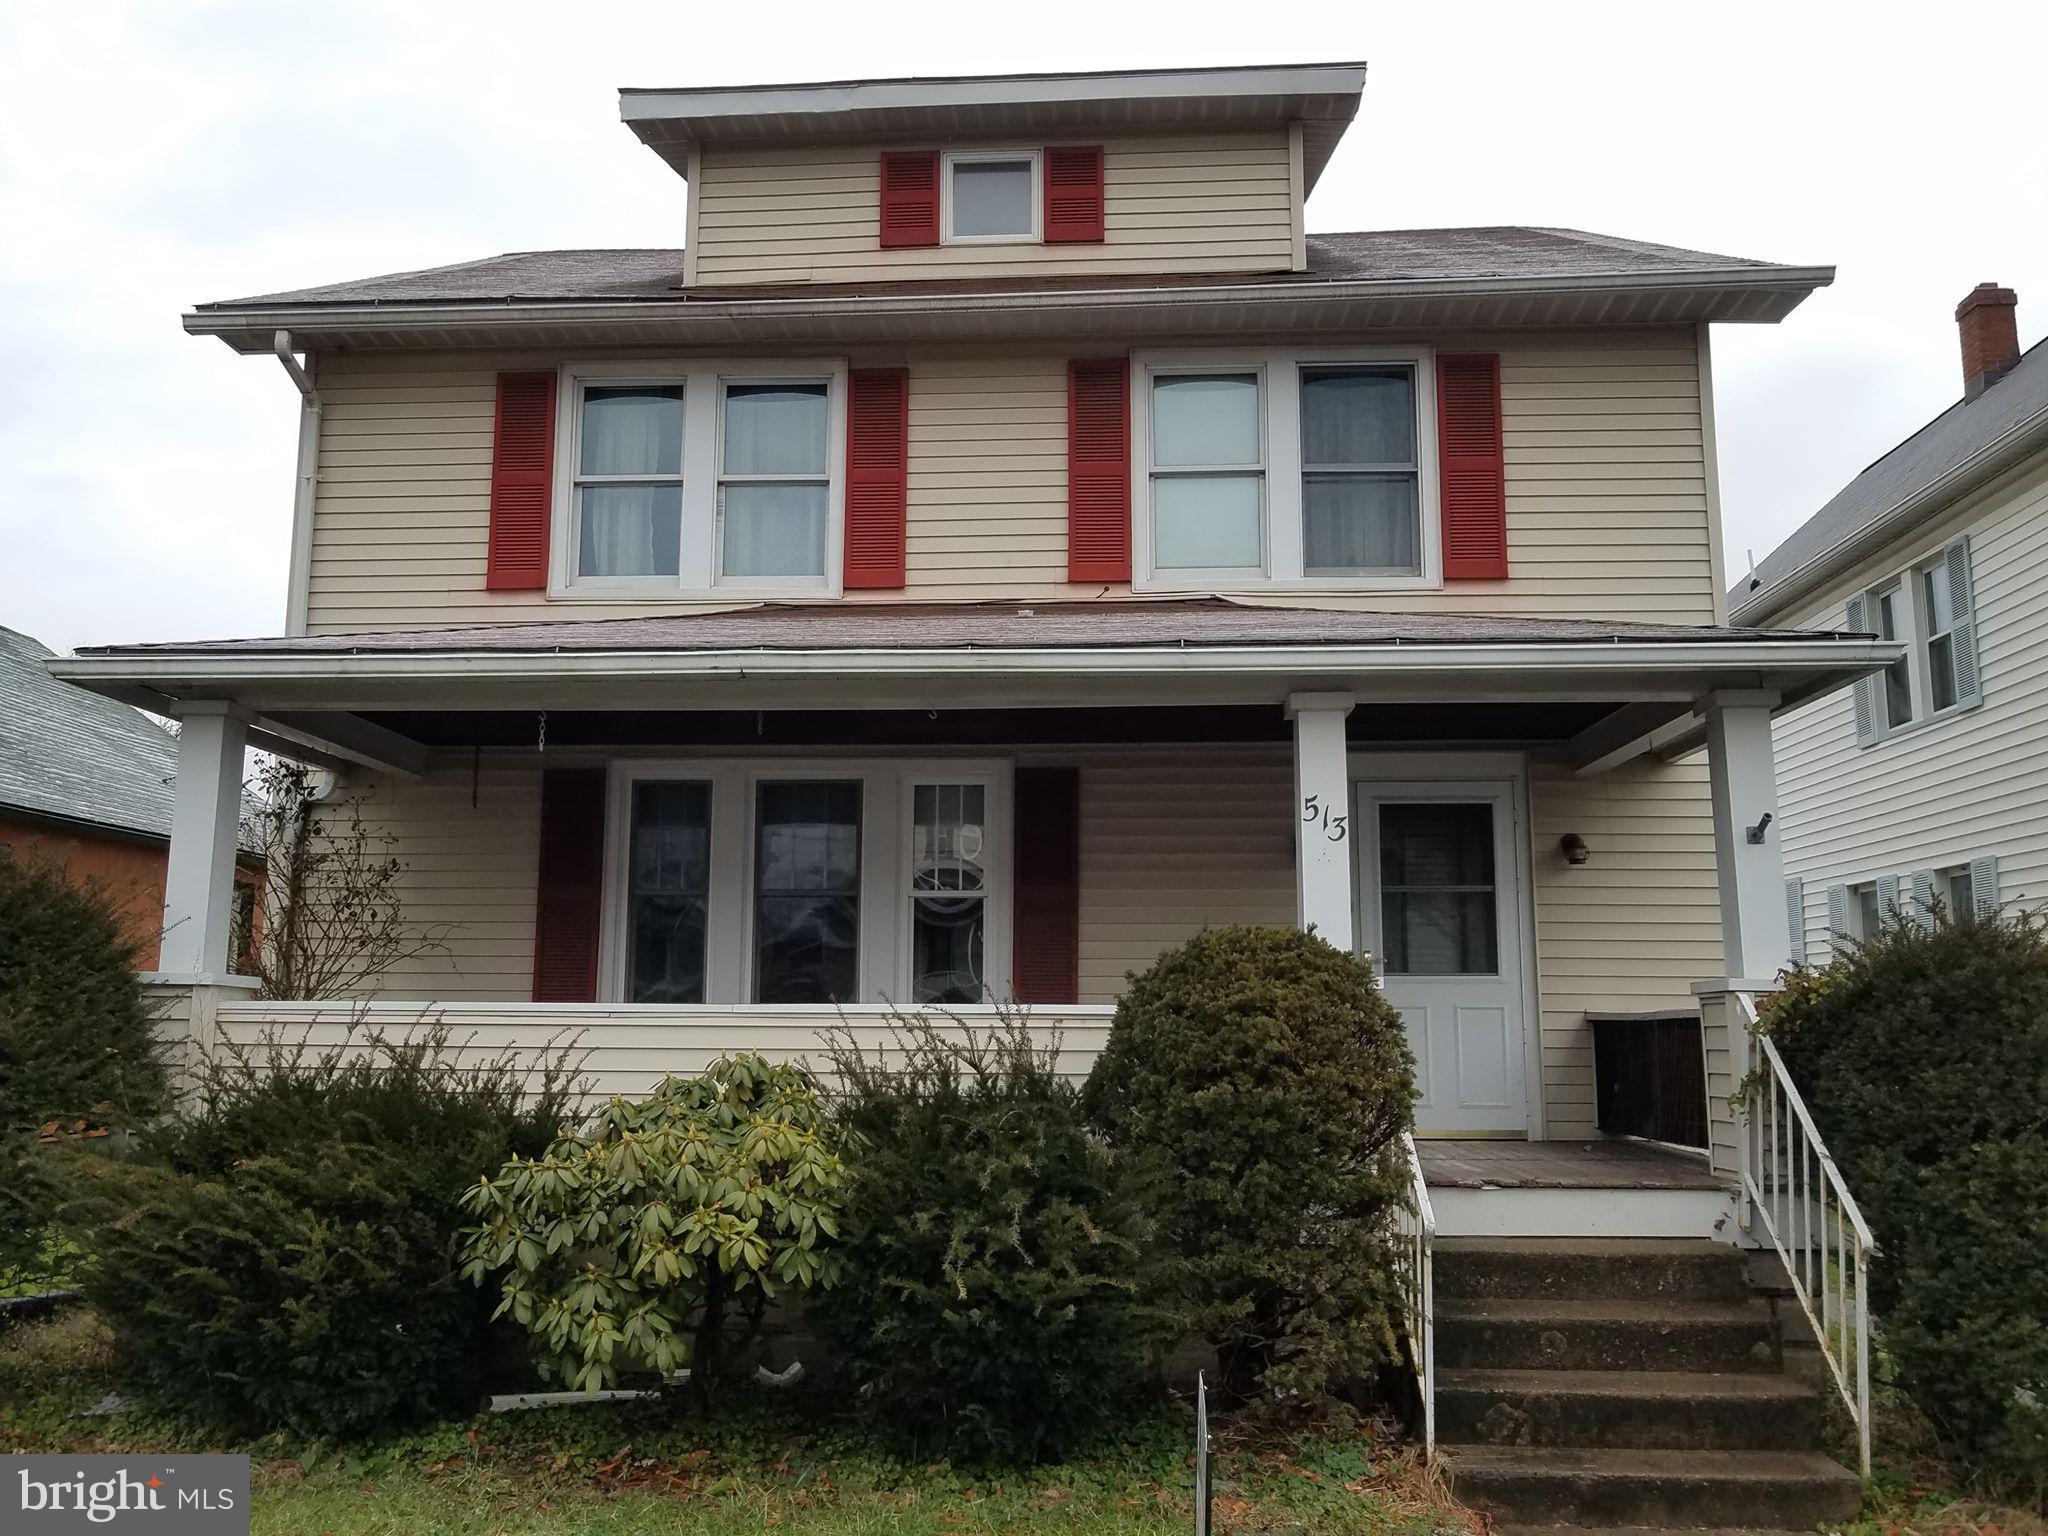 513 WILSON STREET, WILLIAMSPORT, PA 17701